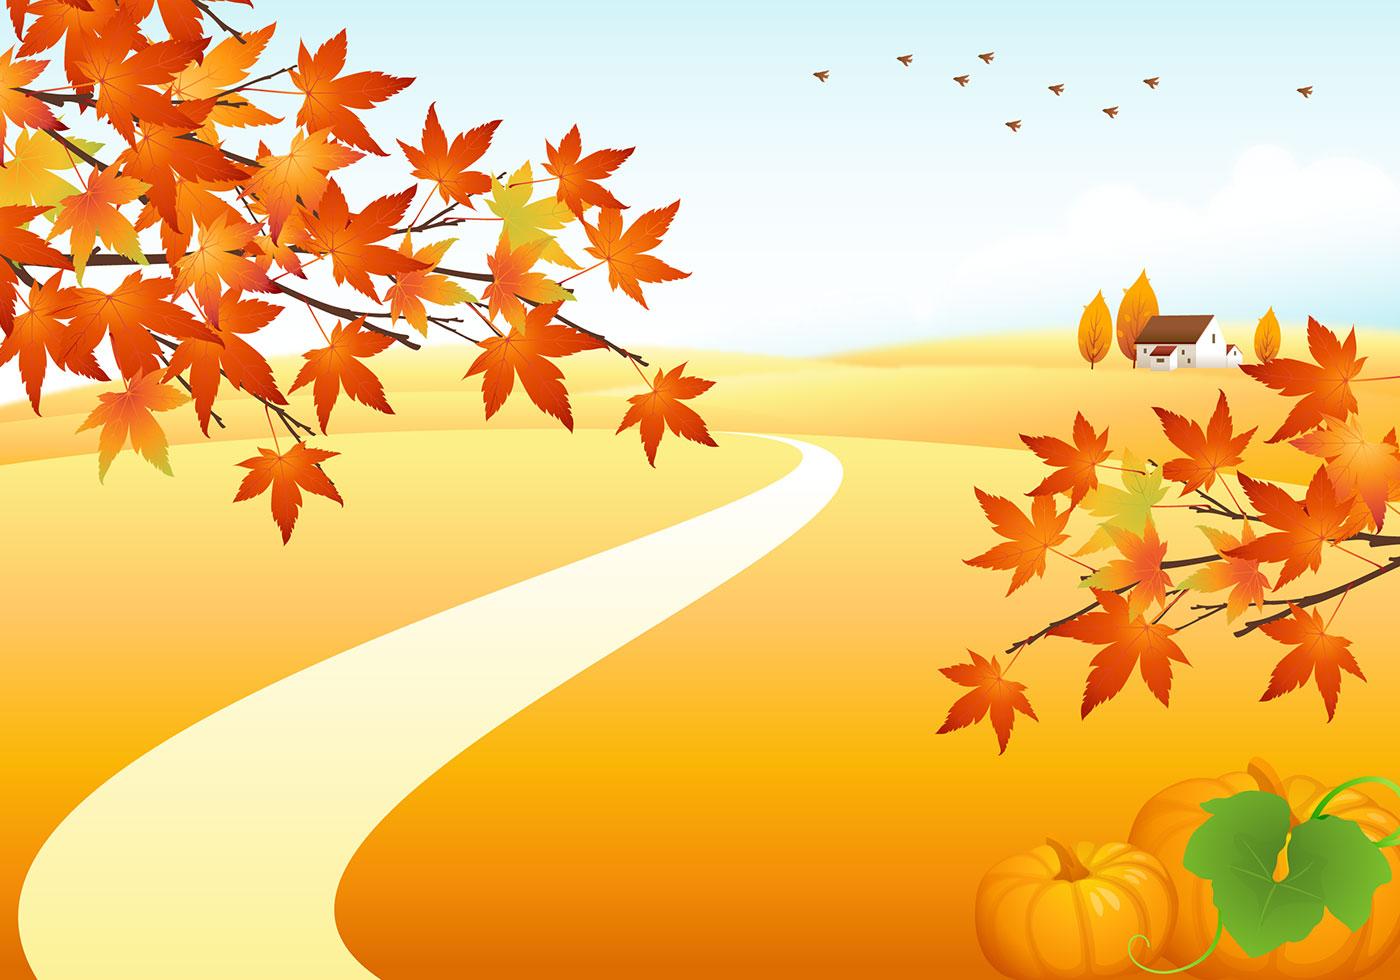 Landscape Illustration Vector Free: Autumn Landscape Photoshop Background